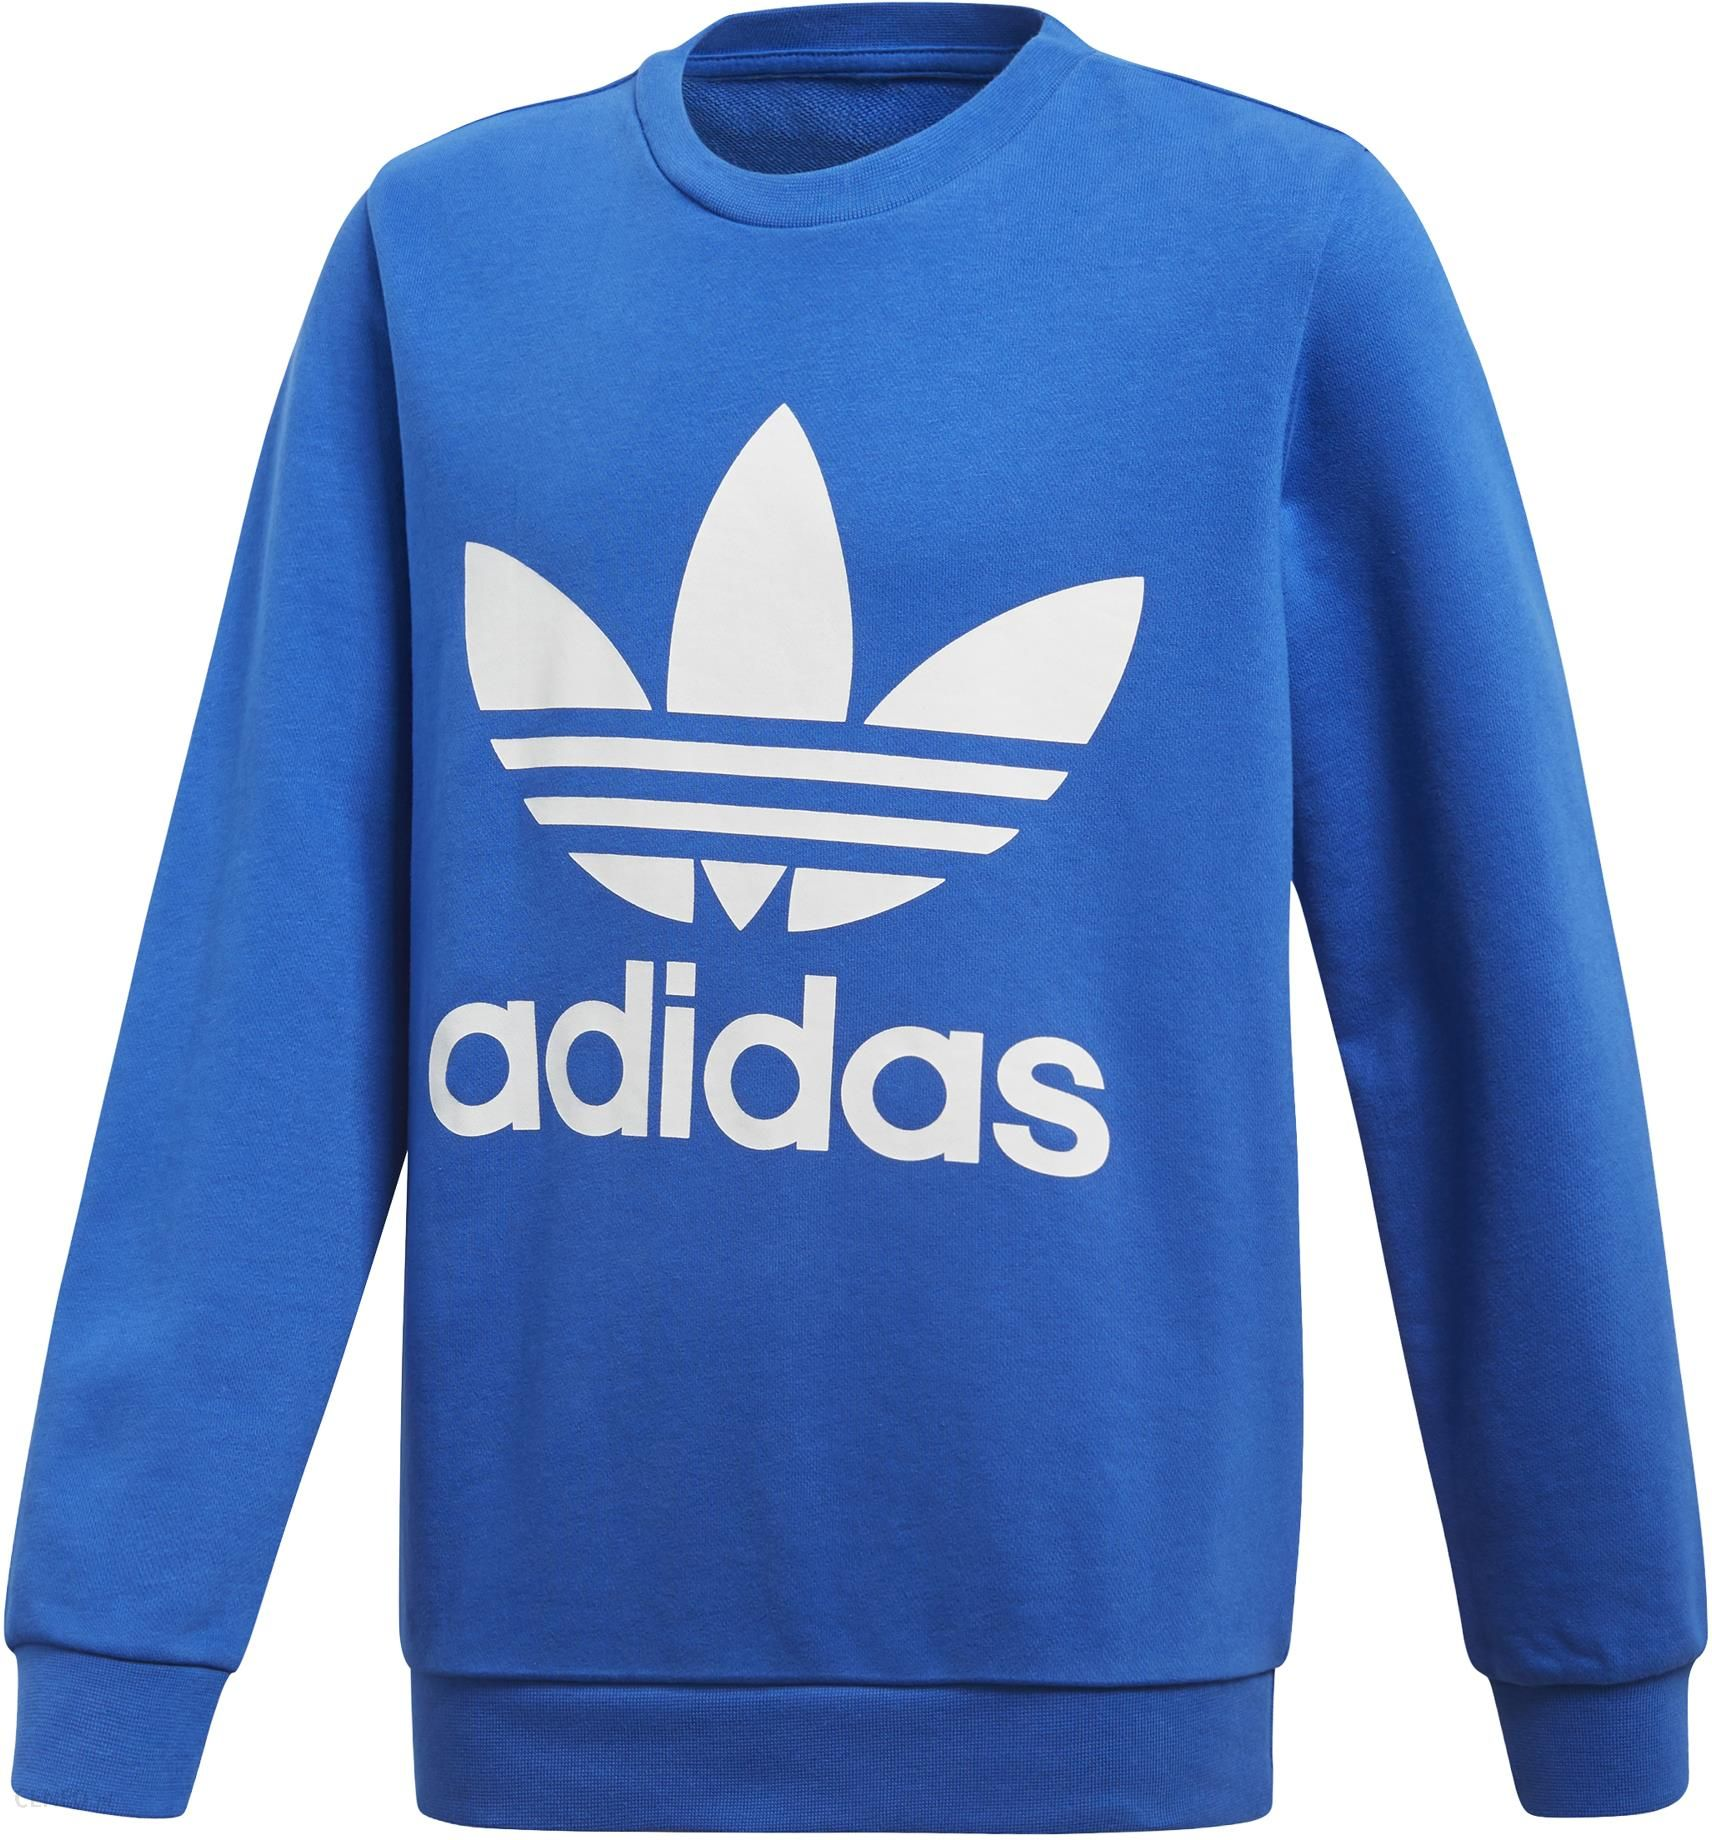 bluza adidas trefoil niebieska